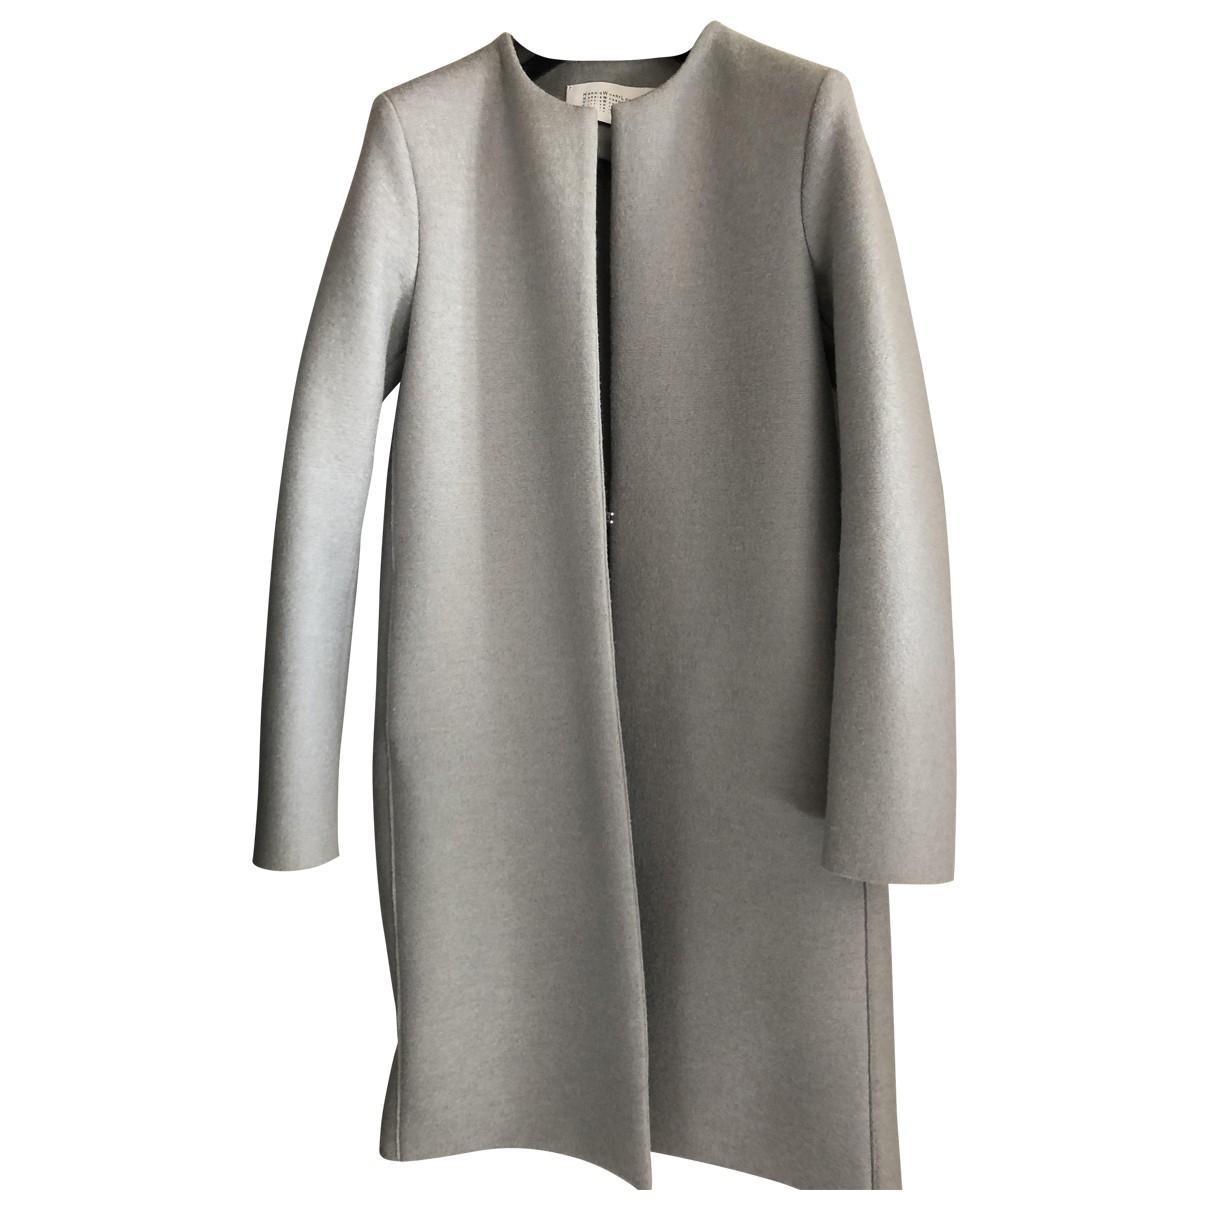 Harris Wharf London \N Grey Wool coat for Women 38 IT